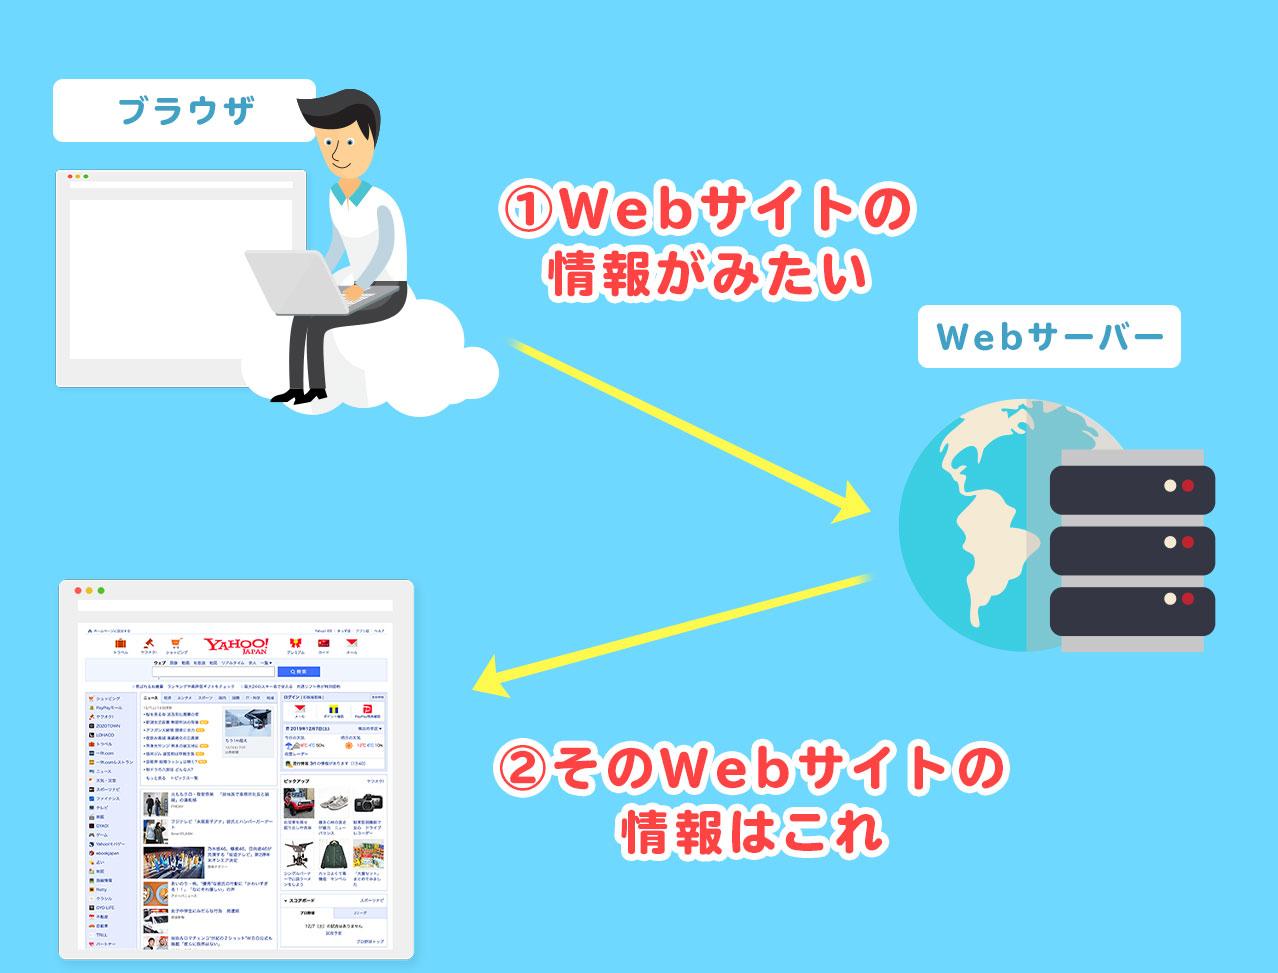 WebサイトとWebサーバー